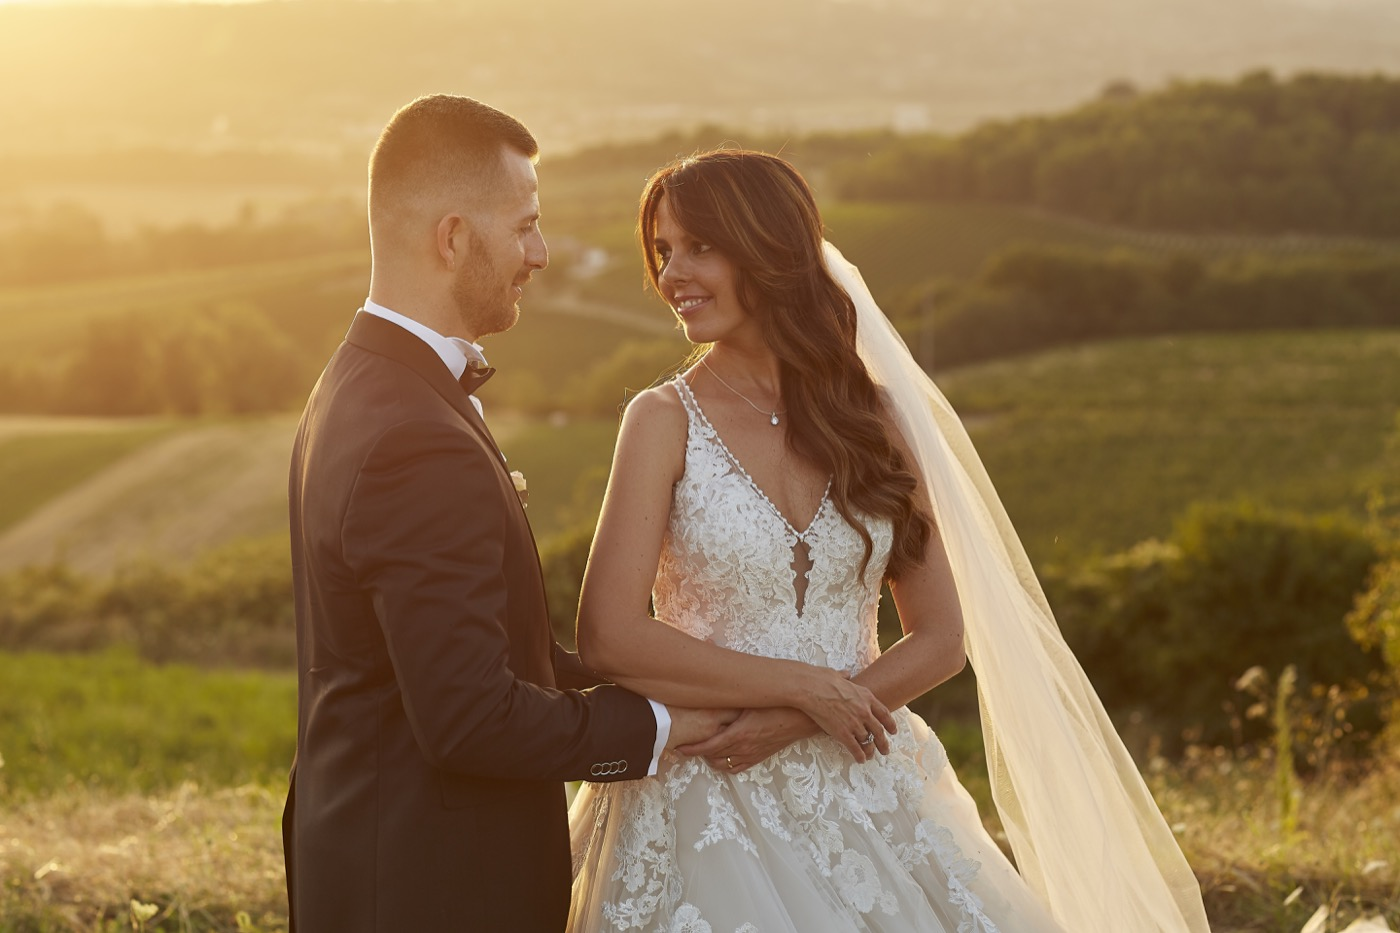 Claudio-Coppola-wedding-photographer-la-scuderia-eventi-preparativi-la-rosetta-perugia-78